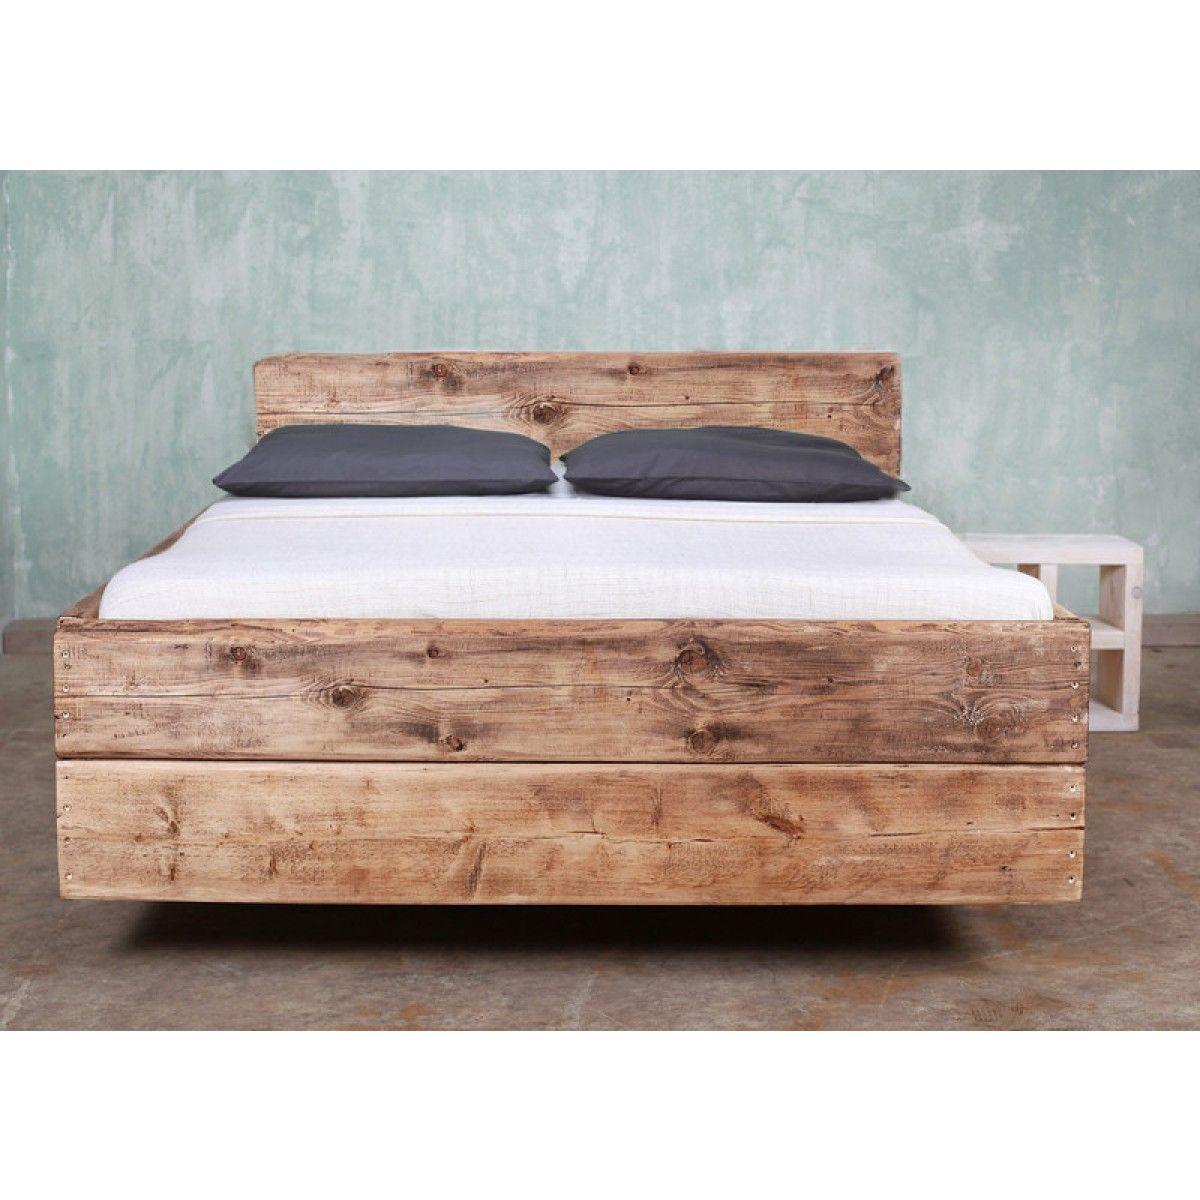 Full Size of Rustikale Betten Selber Bauen Rustikal Bett Massivholzbetten Gunstig Holzbetten Rustikales Kaufen Bettgestell Aus Holz 140x200 Komplett Stapelbar Weißes Bett Rustikales Bett